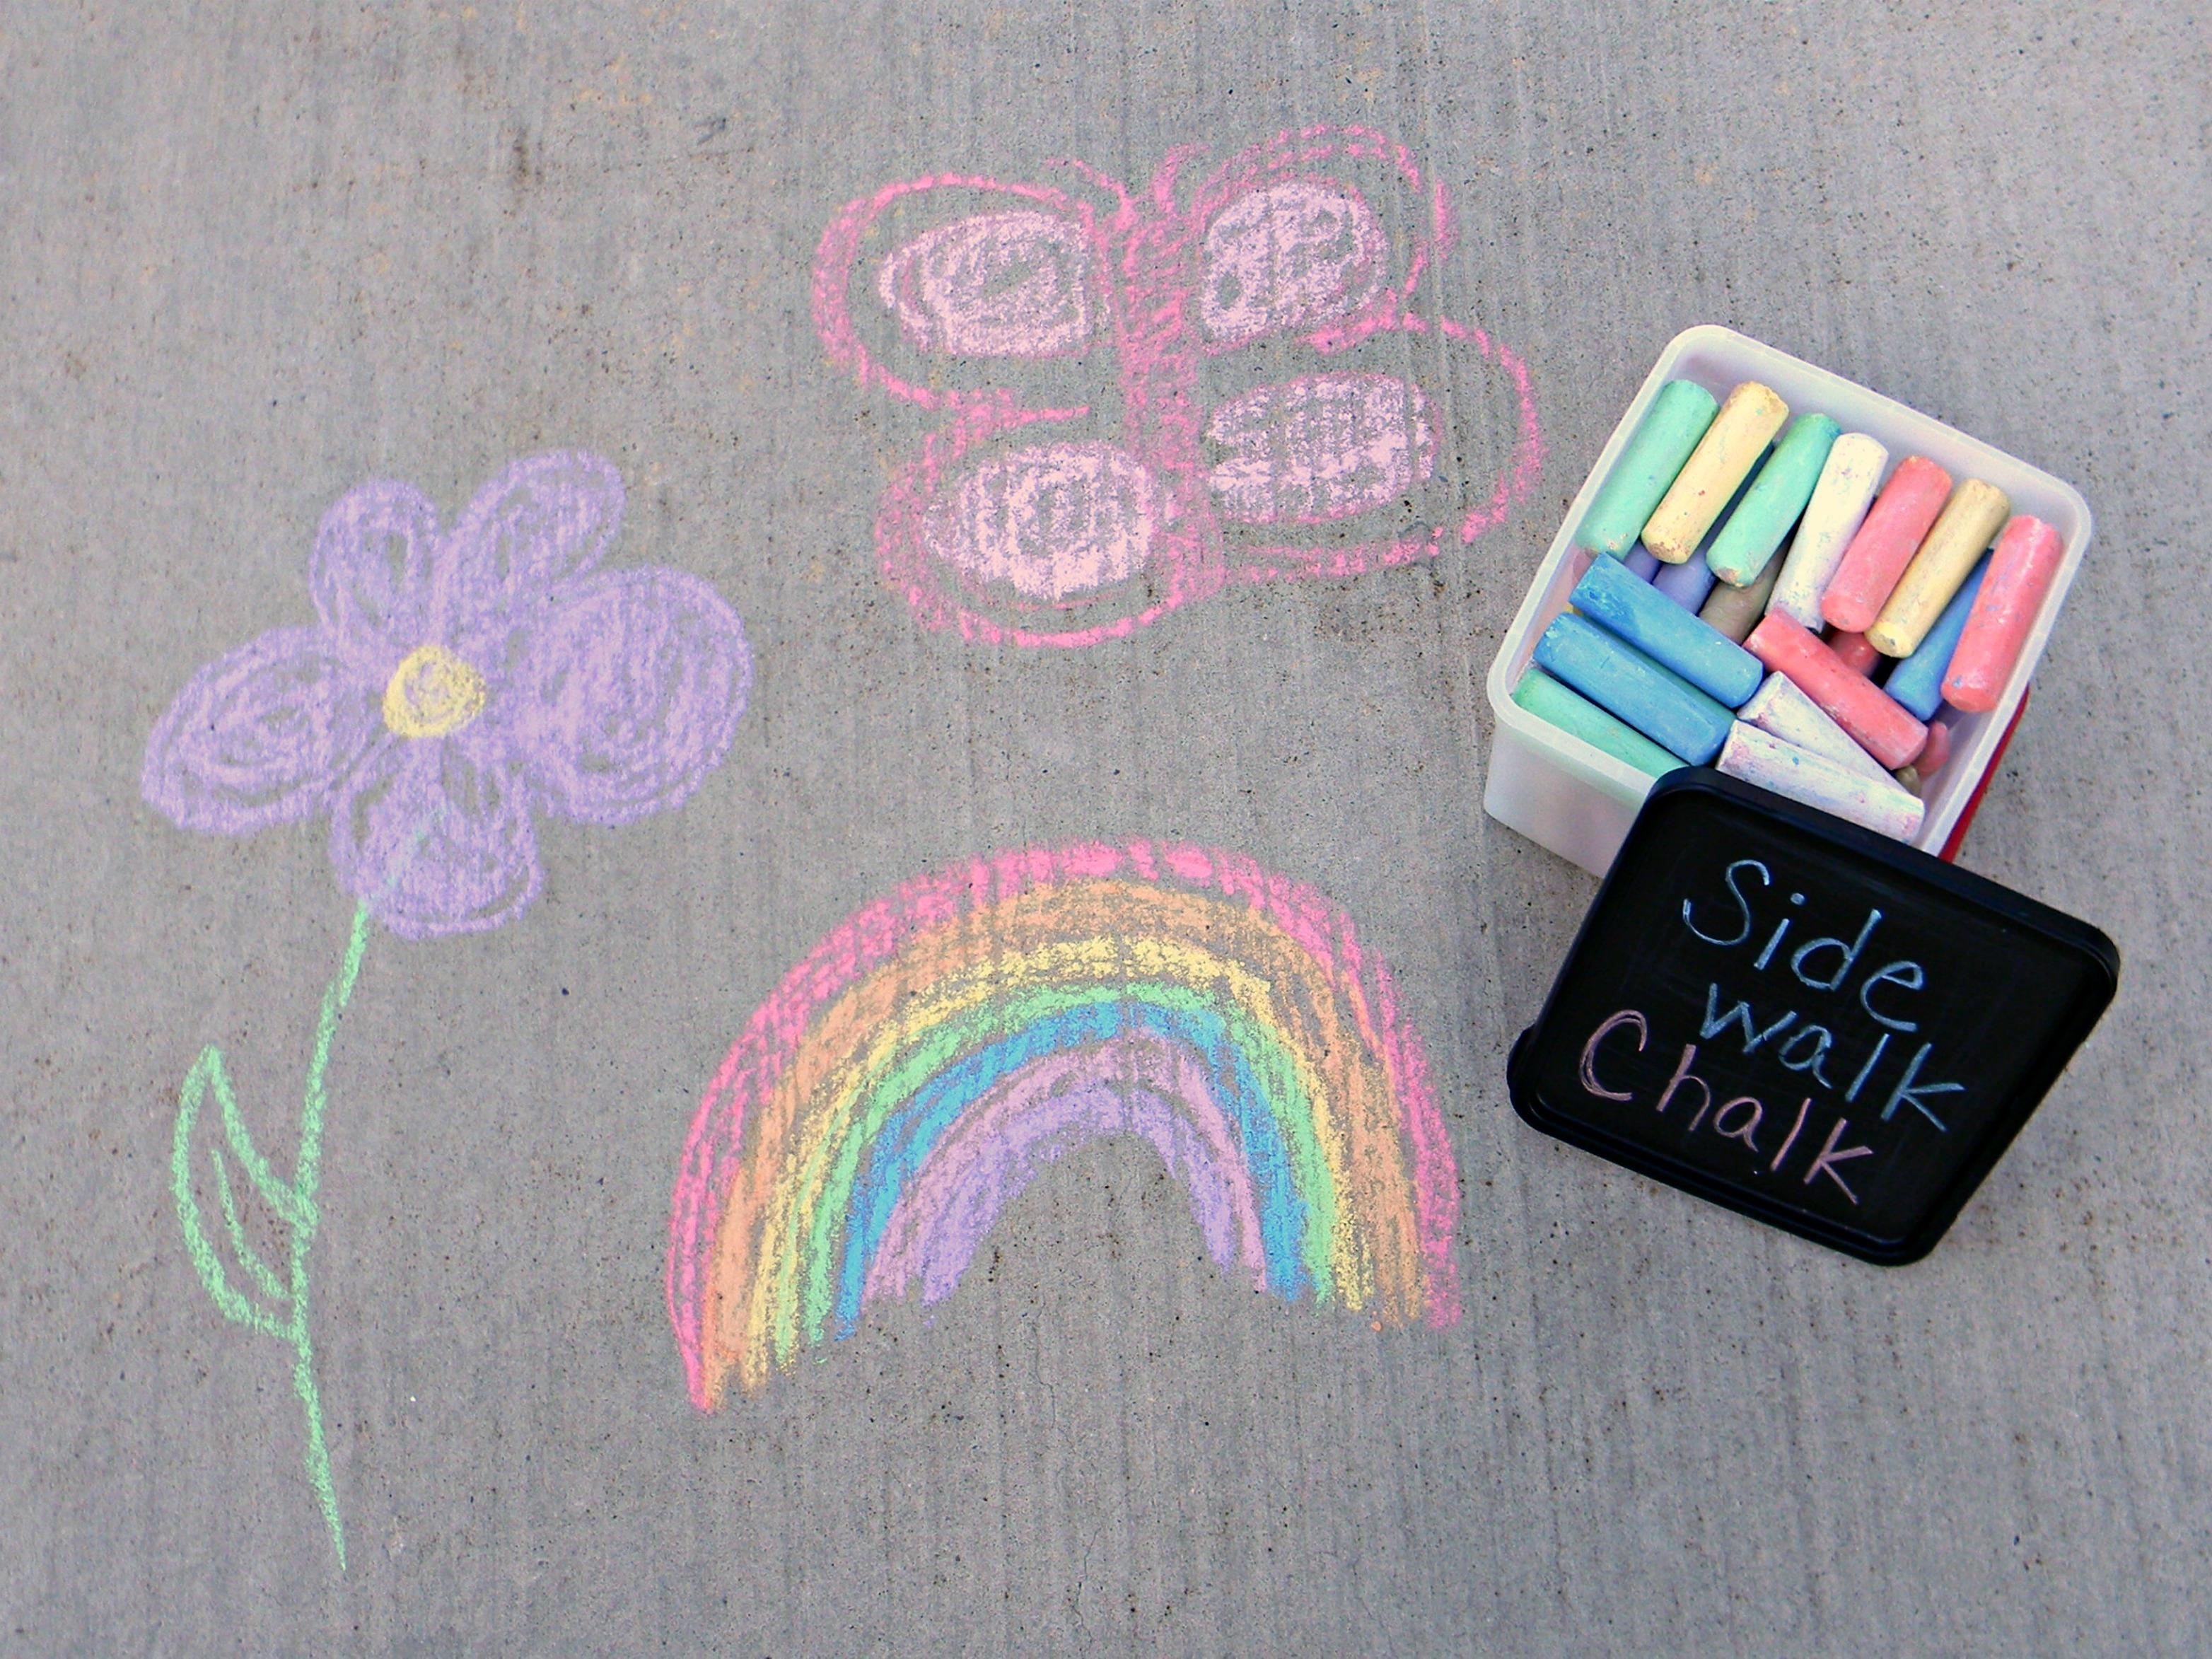 http://organizeyourstuffnow.com/wp-content/uploads/2012/07/chalk-drawing.jpg